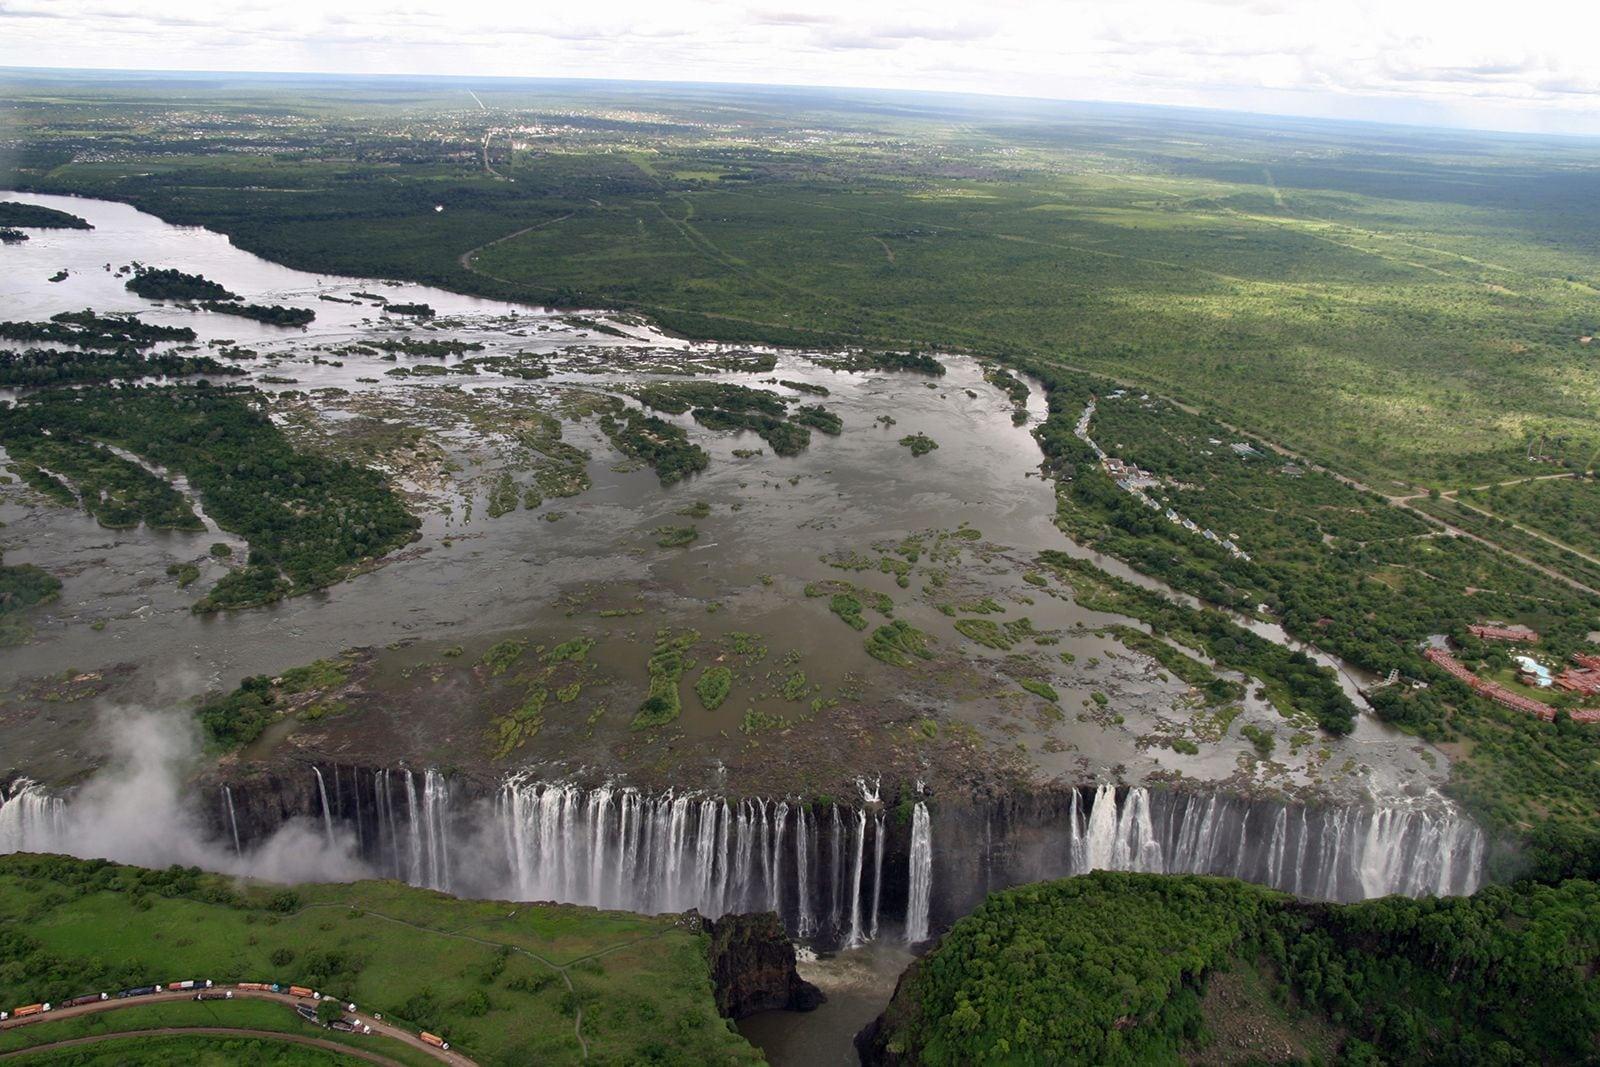 No riding. Accommodation in Victoria Falls, Zimbabwe.